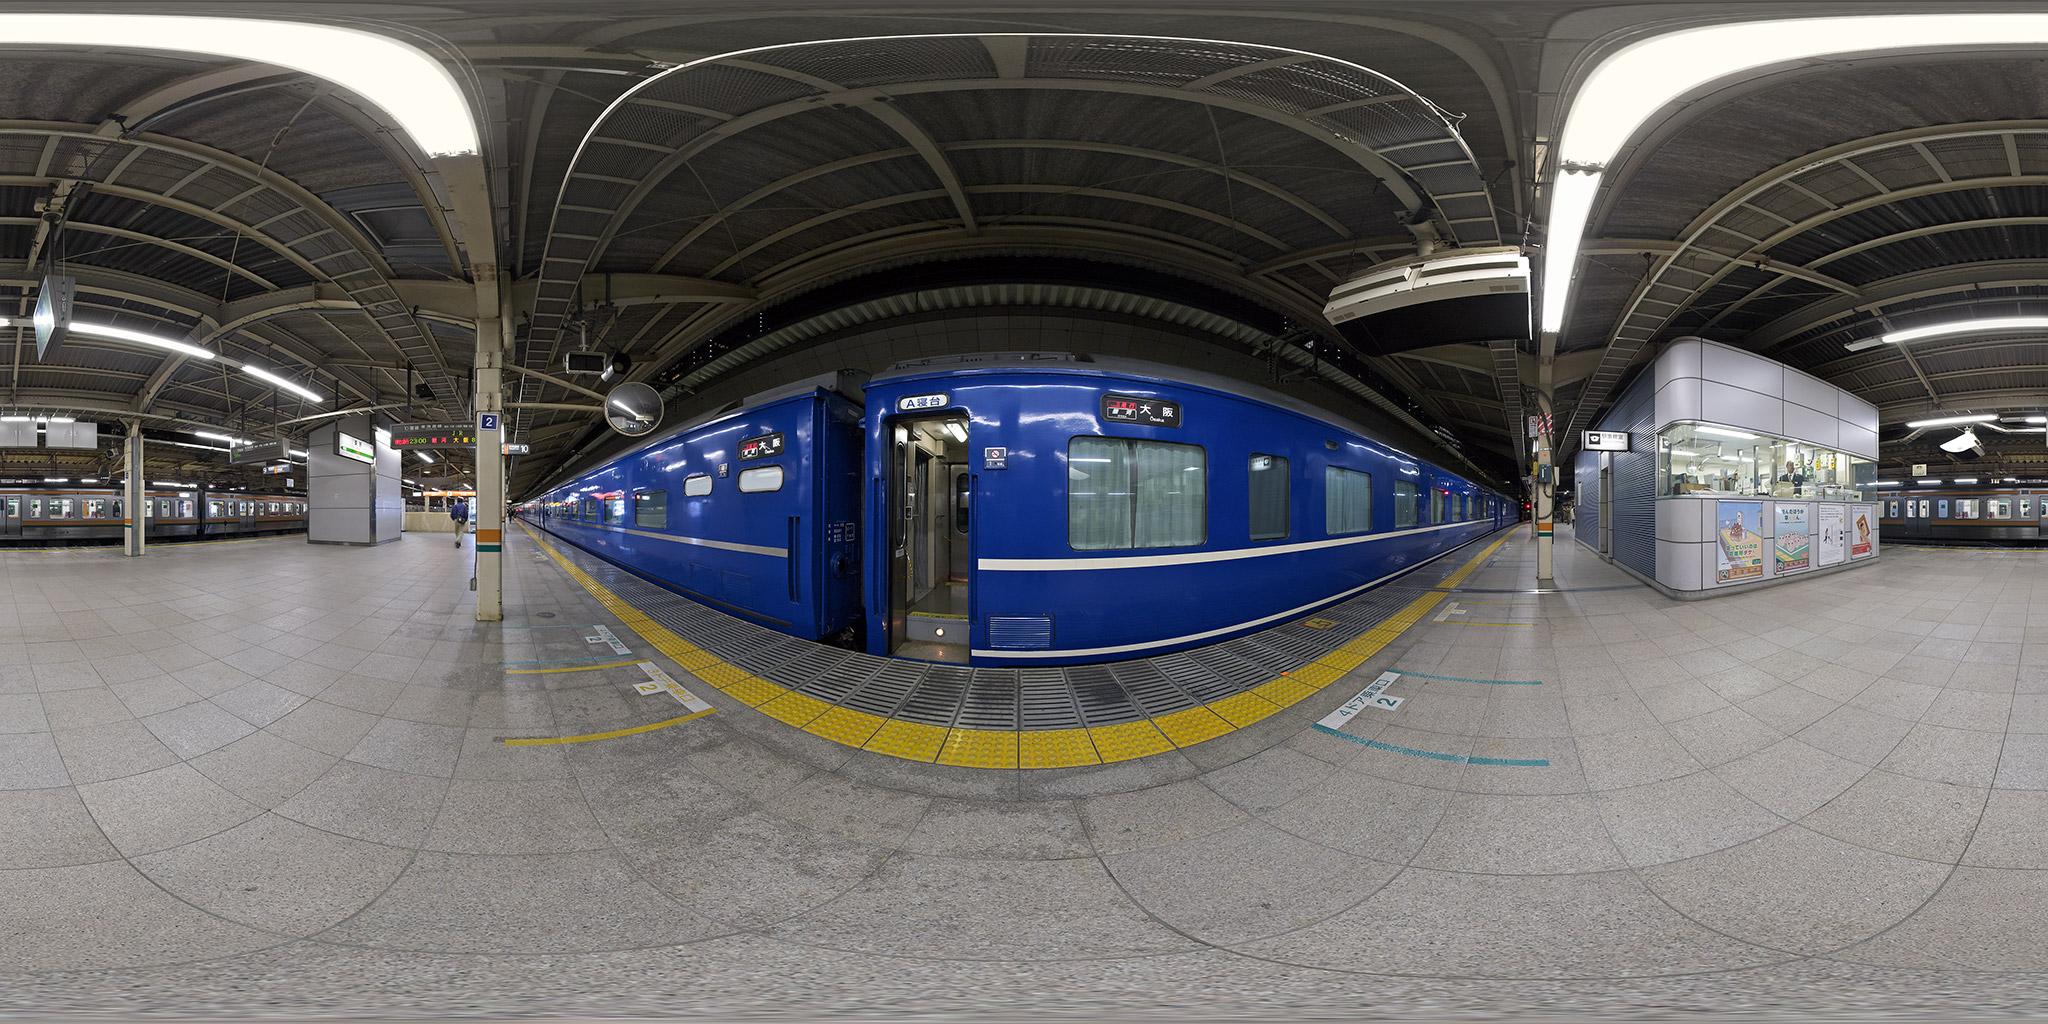 東京駅10番線に停車中の寝台急行「銀河」